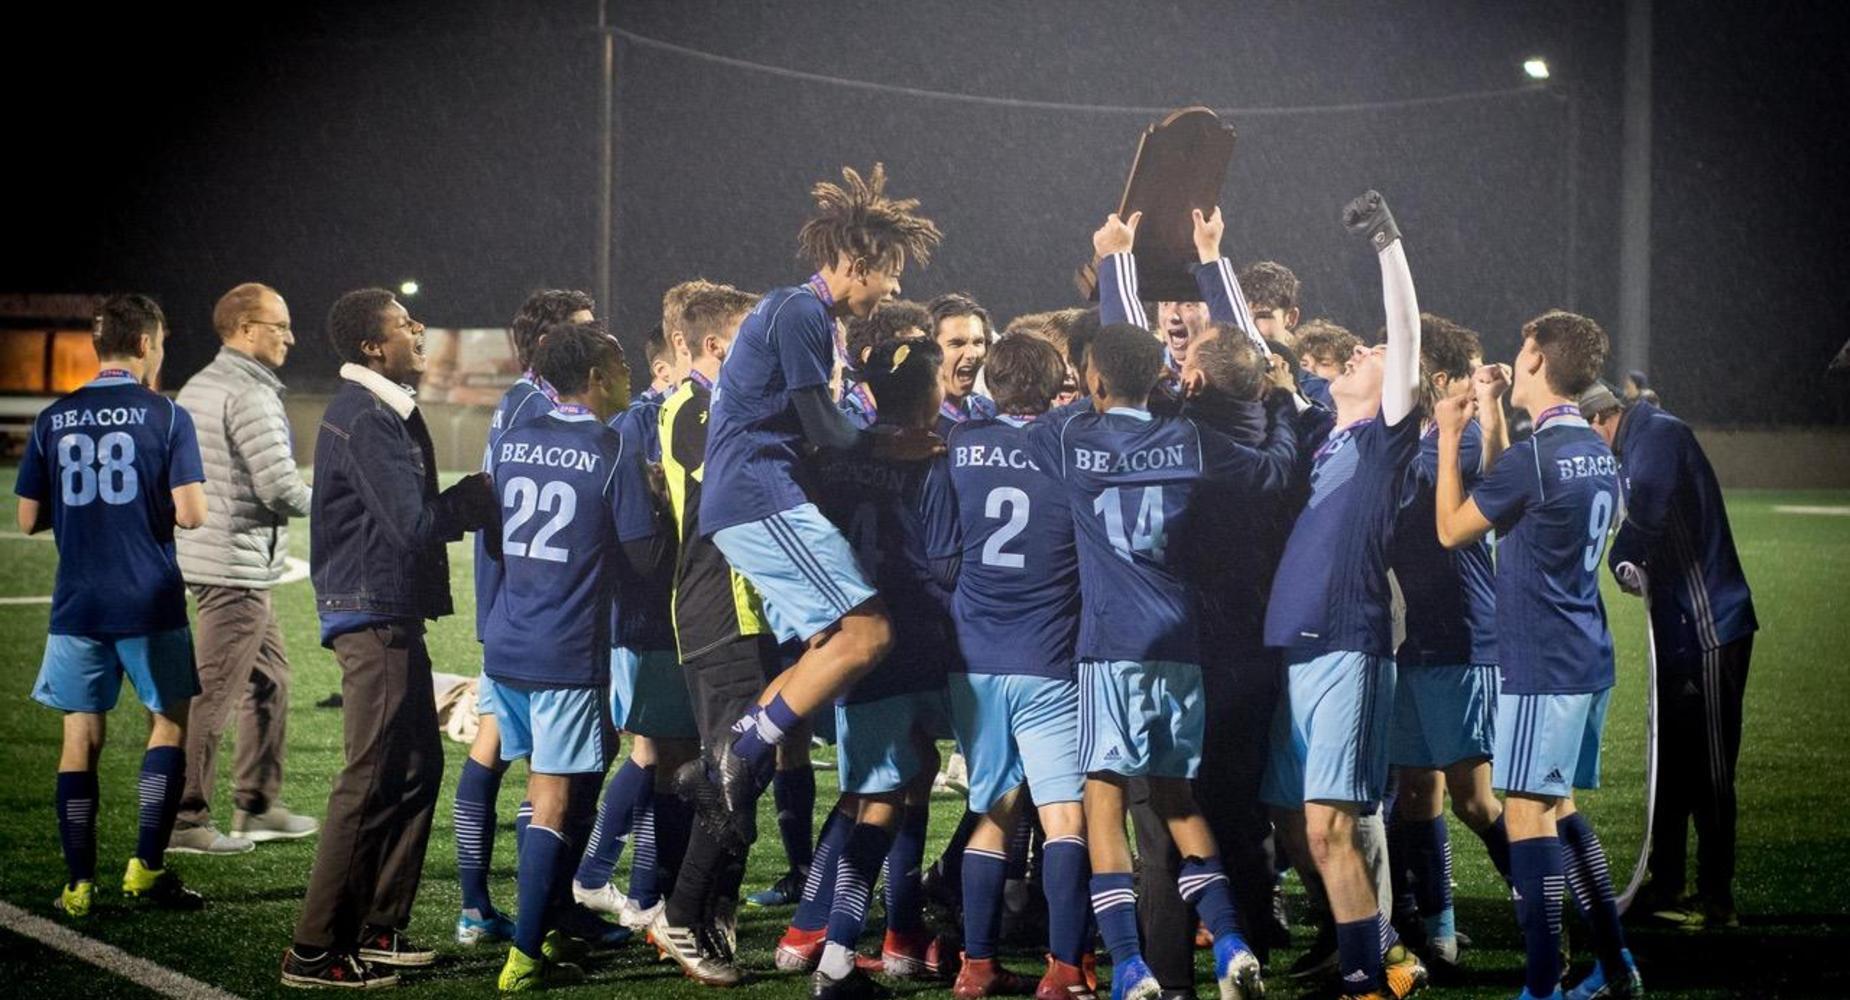 Beacon's Soccer Team celebrates the Finals